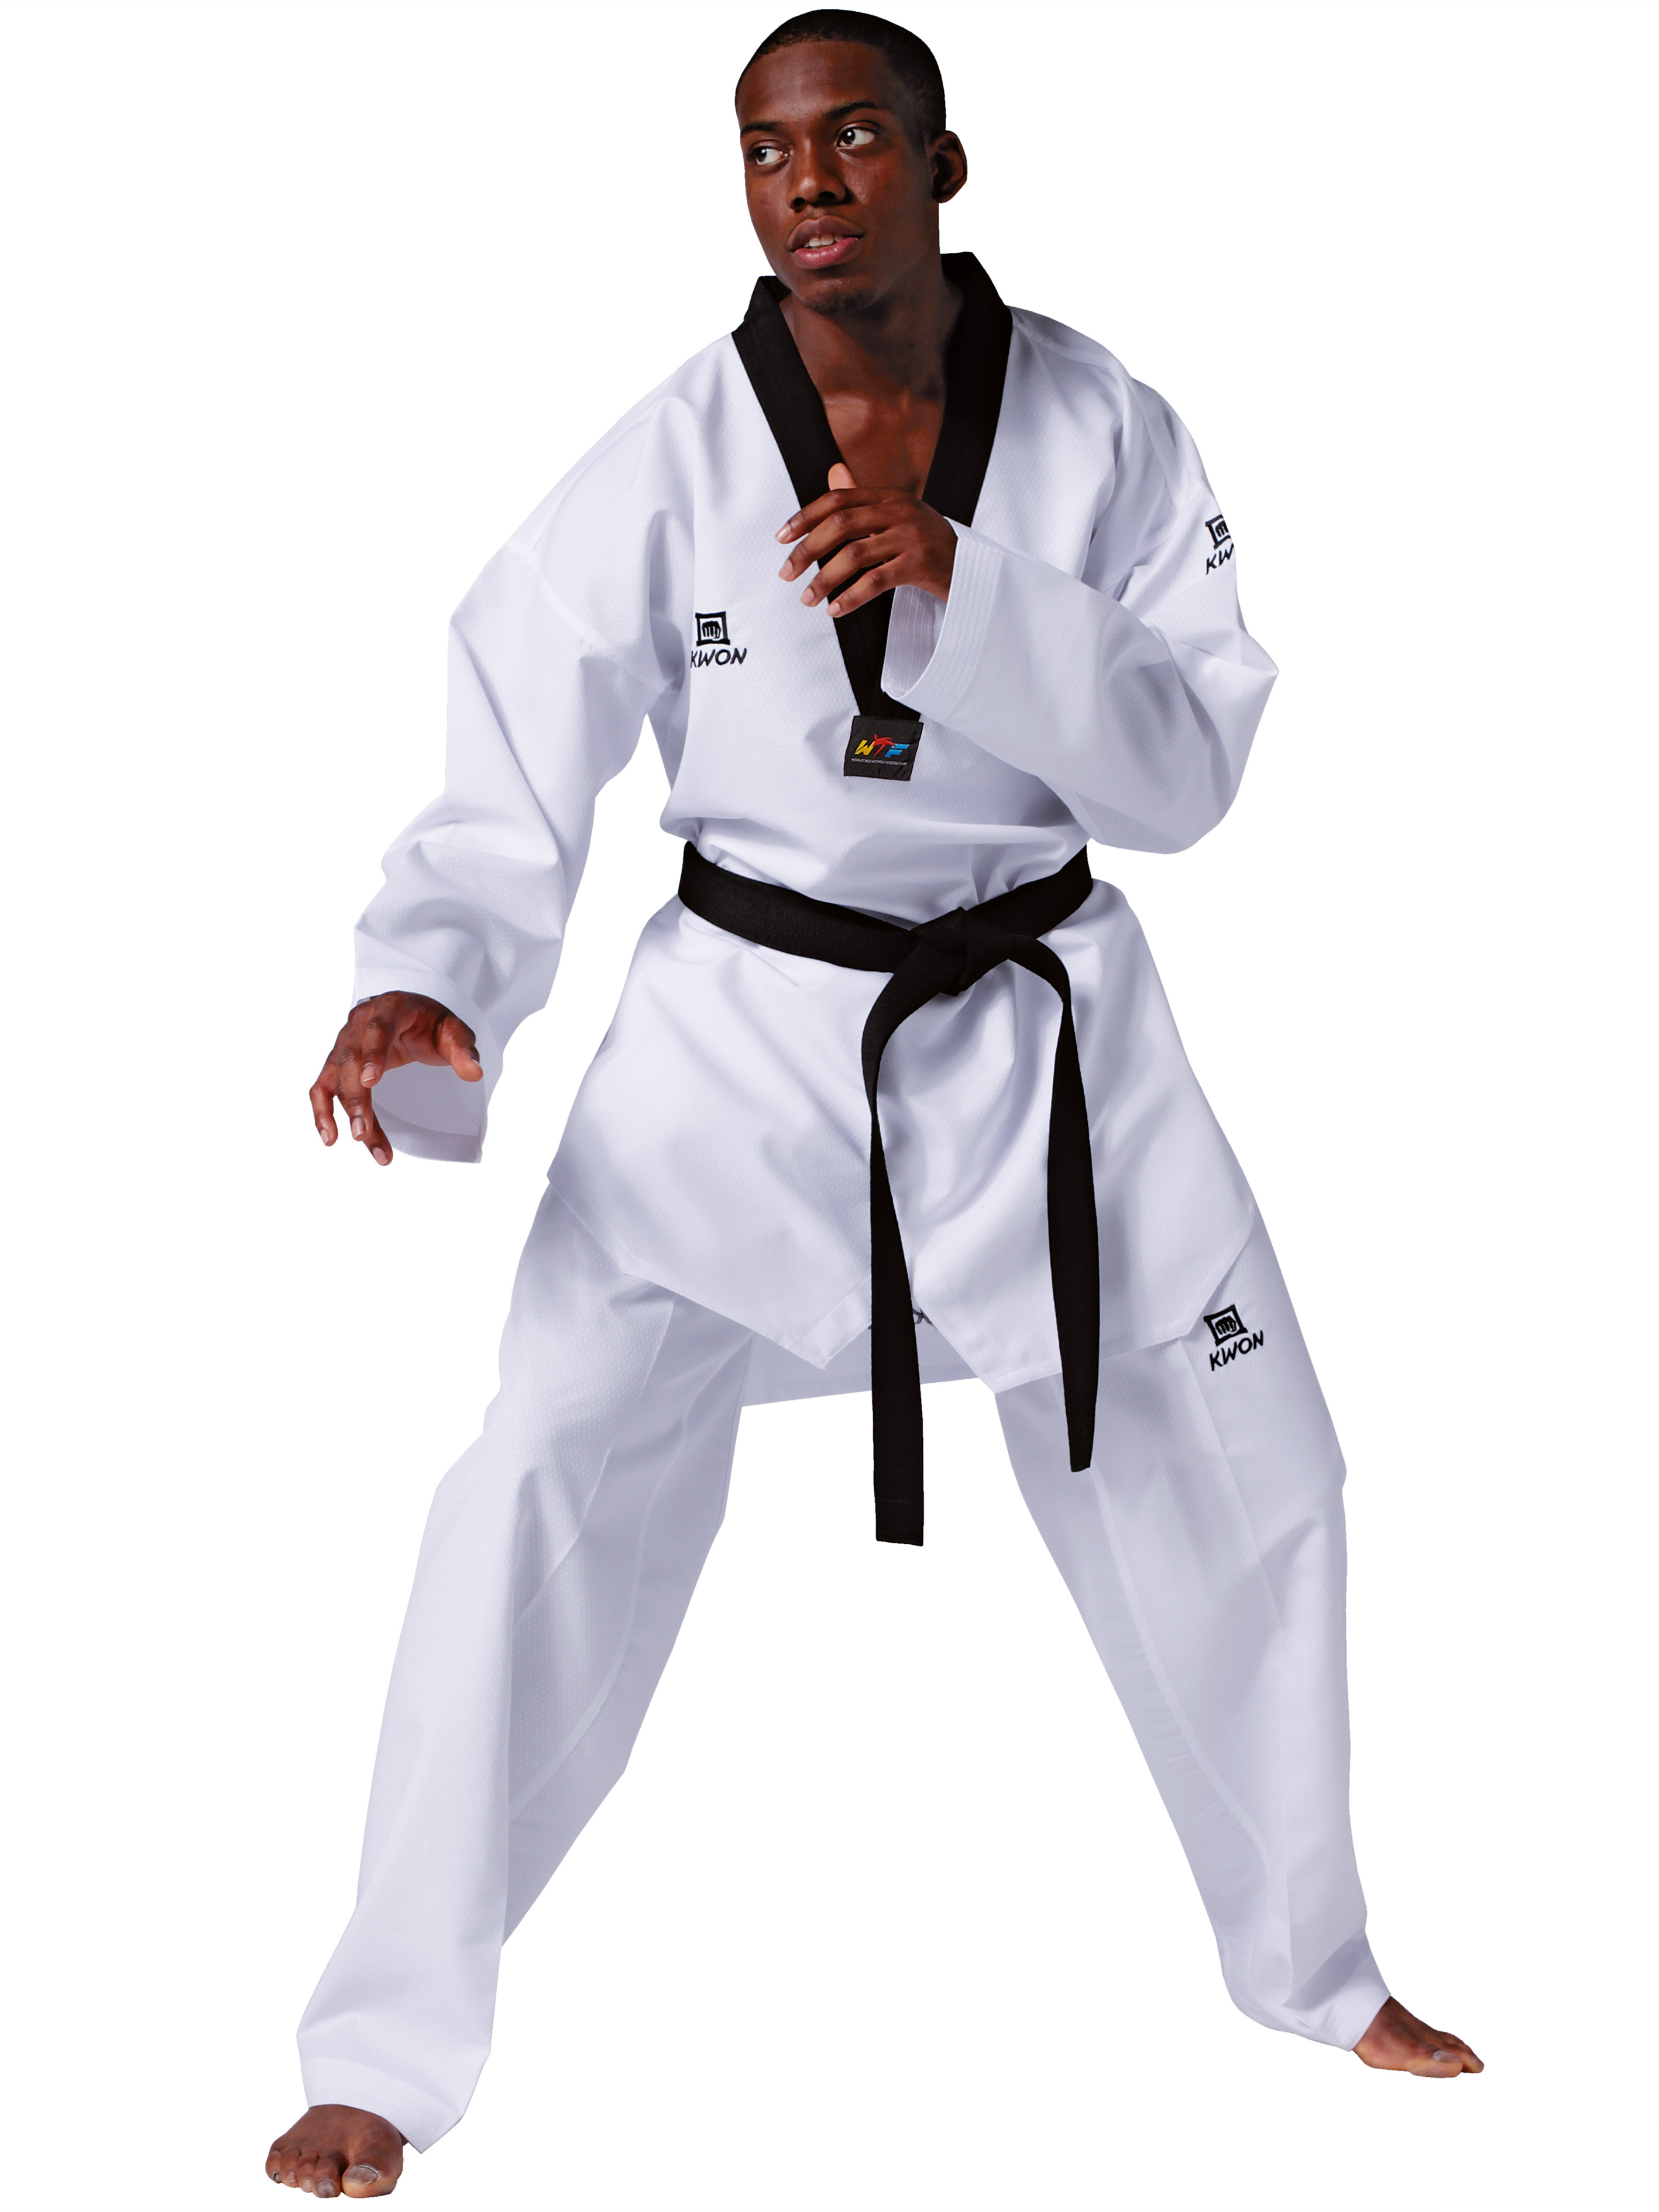 taekwondo anzug revolution taekwondo anzug revolution. Black Bedroom Furniture Sets. Home Design Ideas